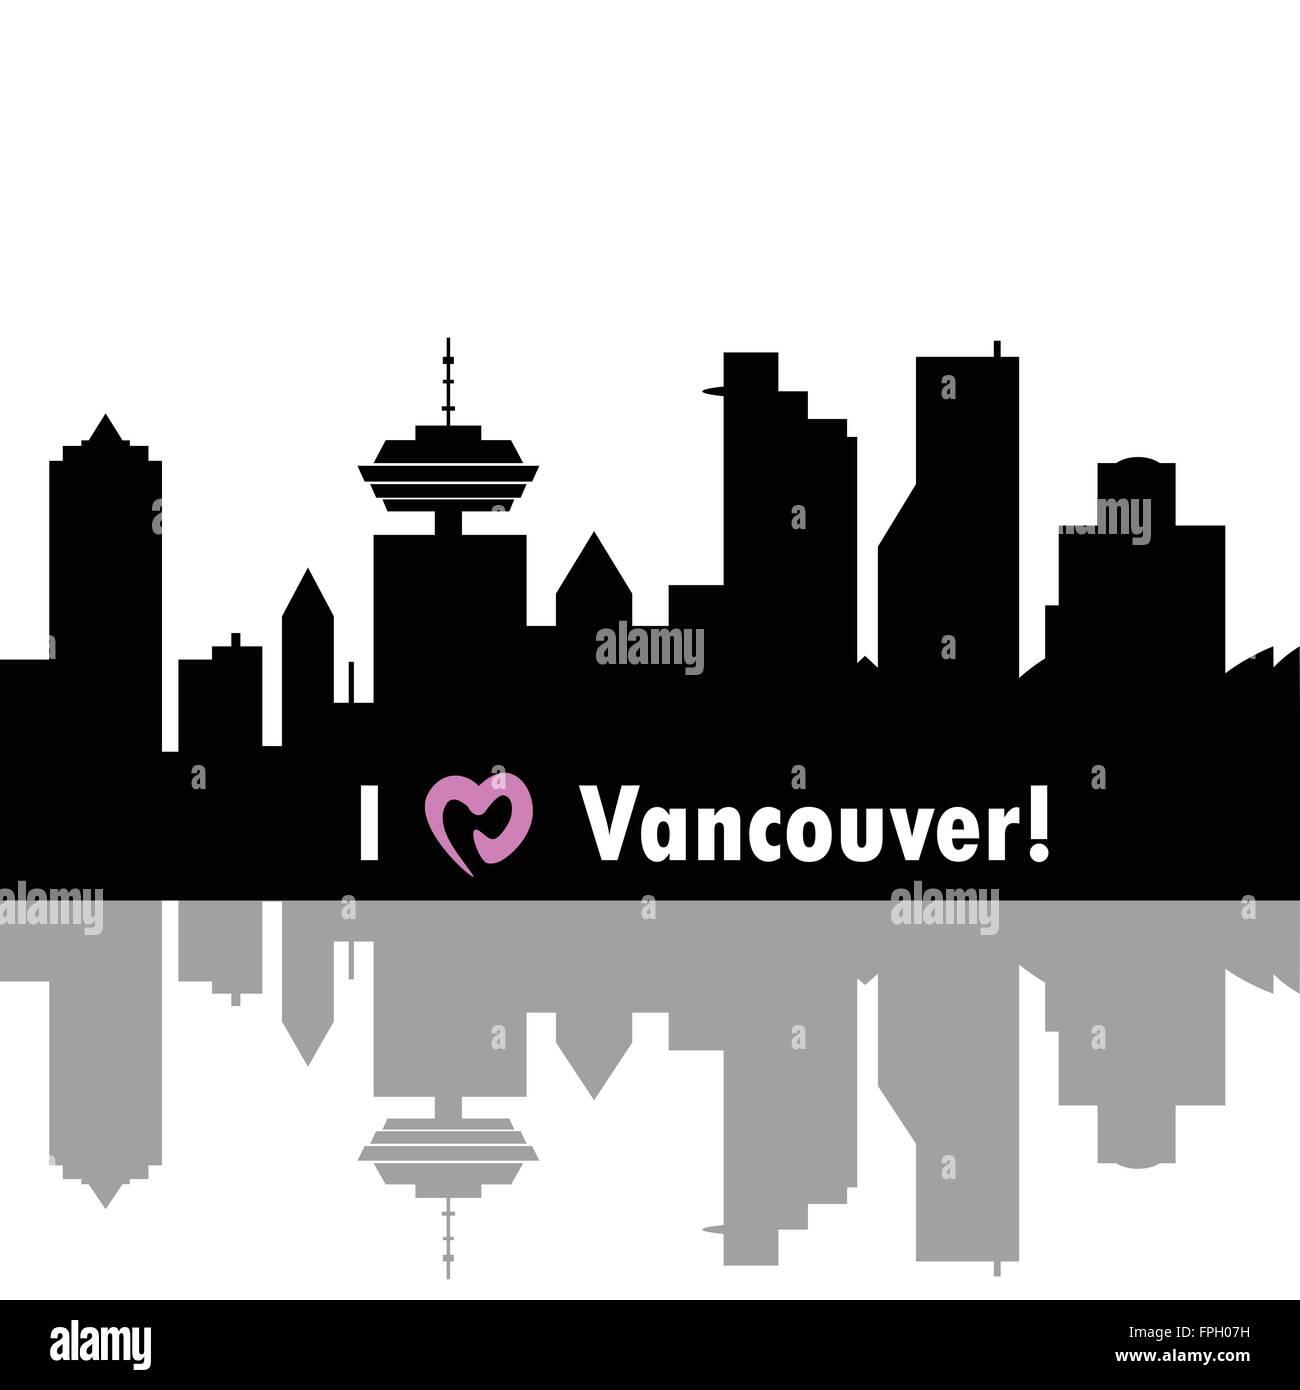 I love Vancouver - Stock Vector